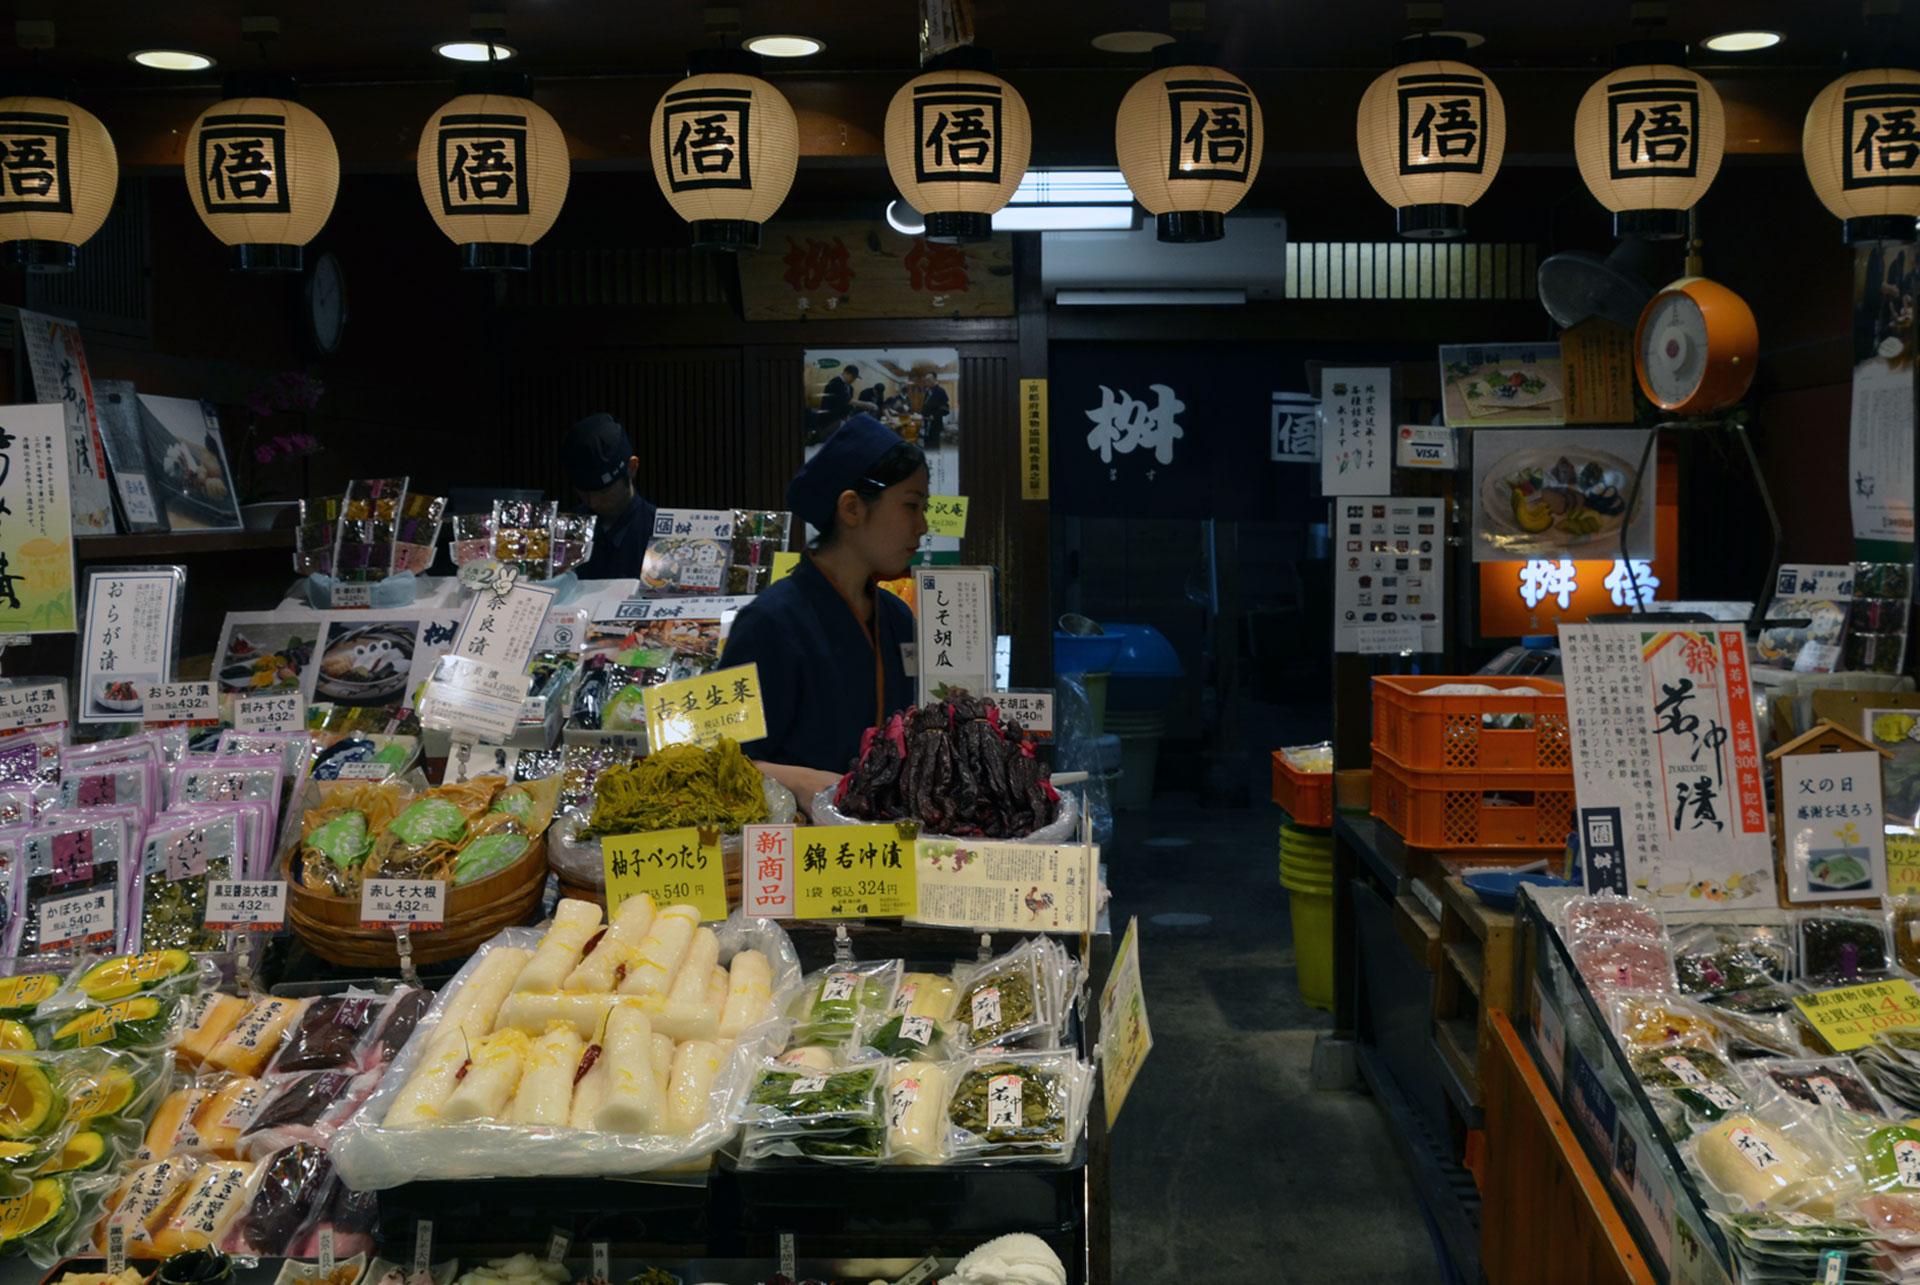 Tsujiki Market in Tokyo